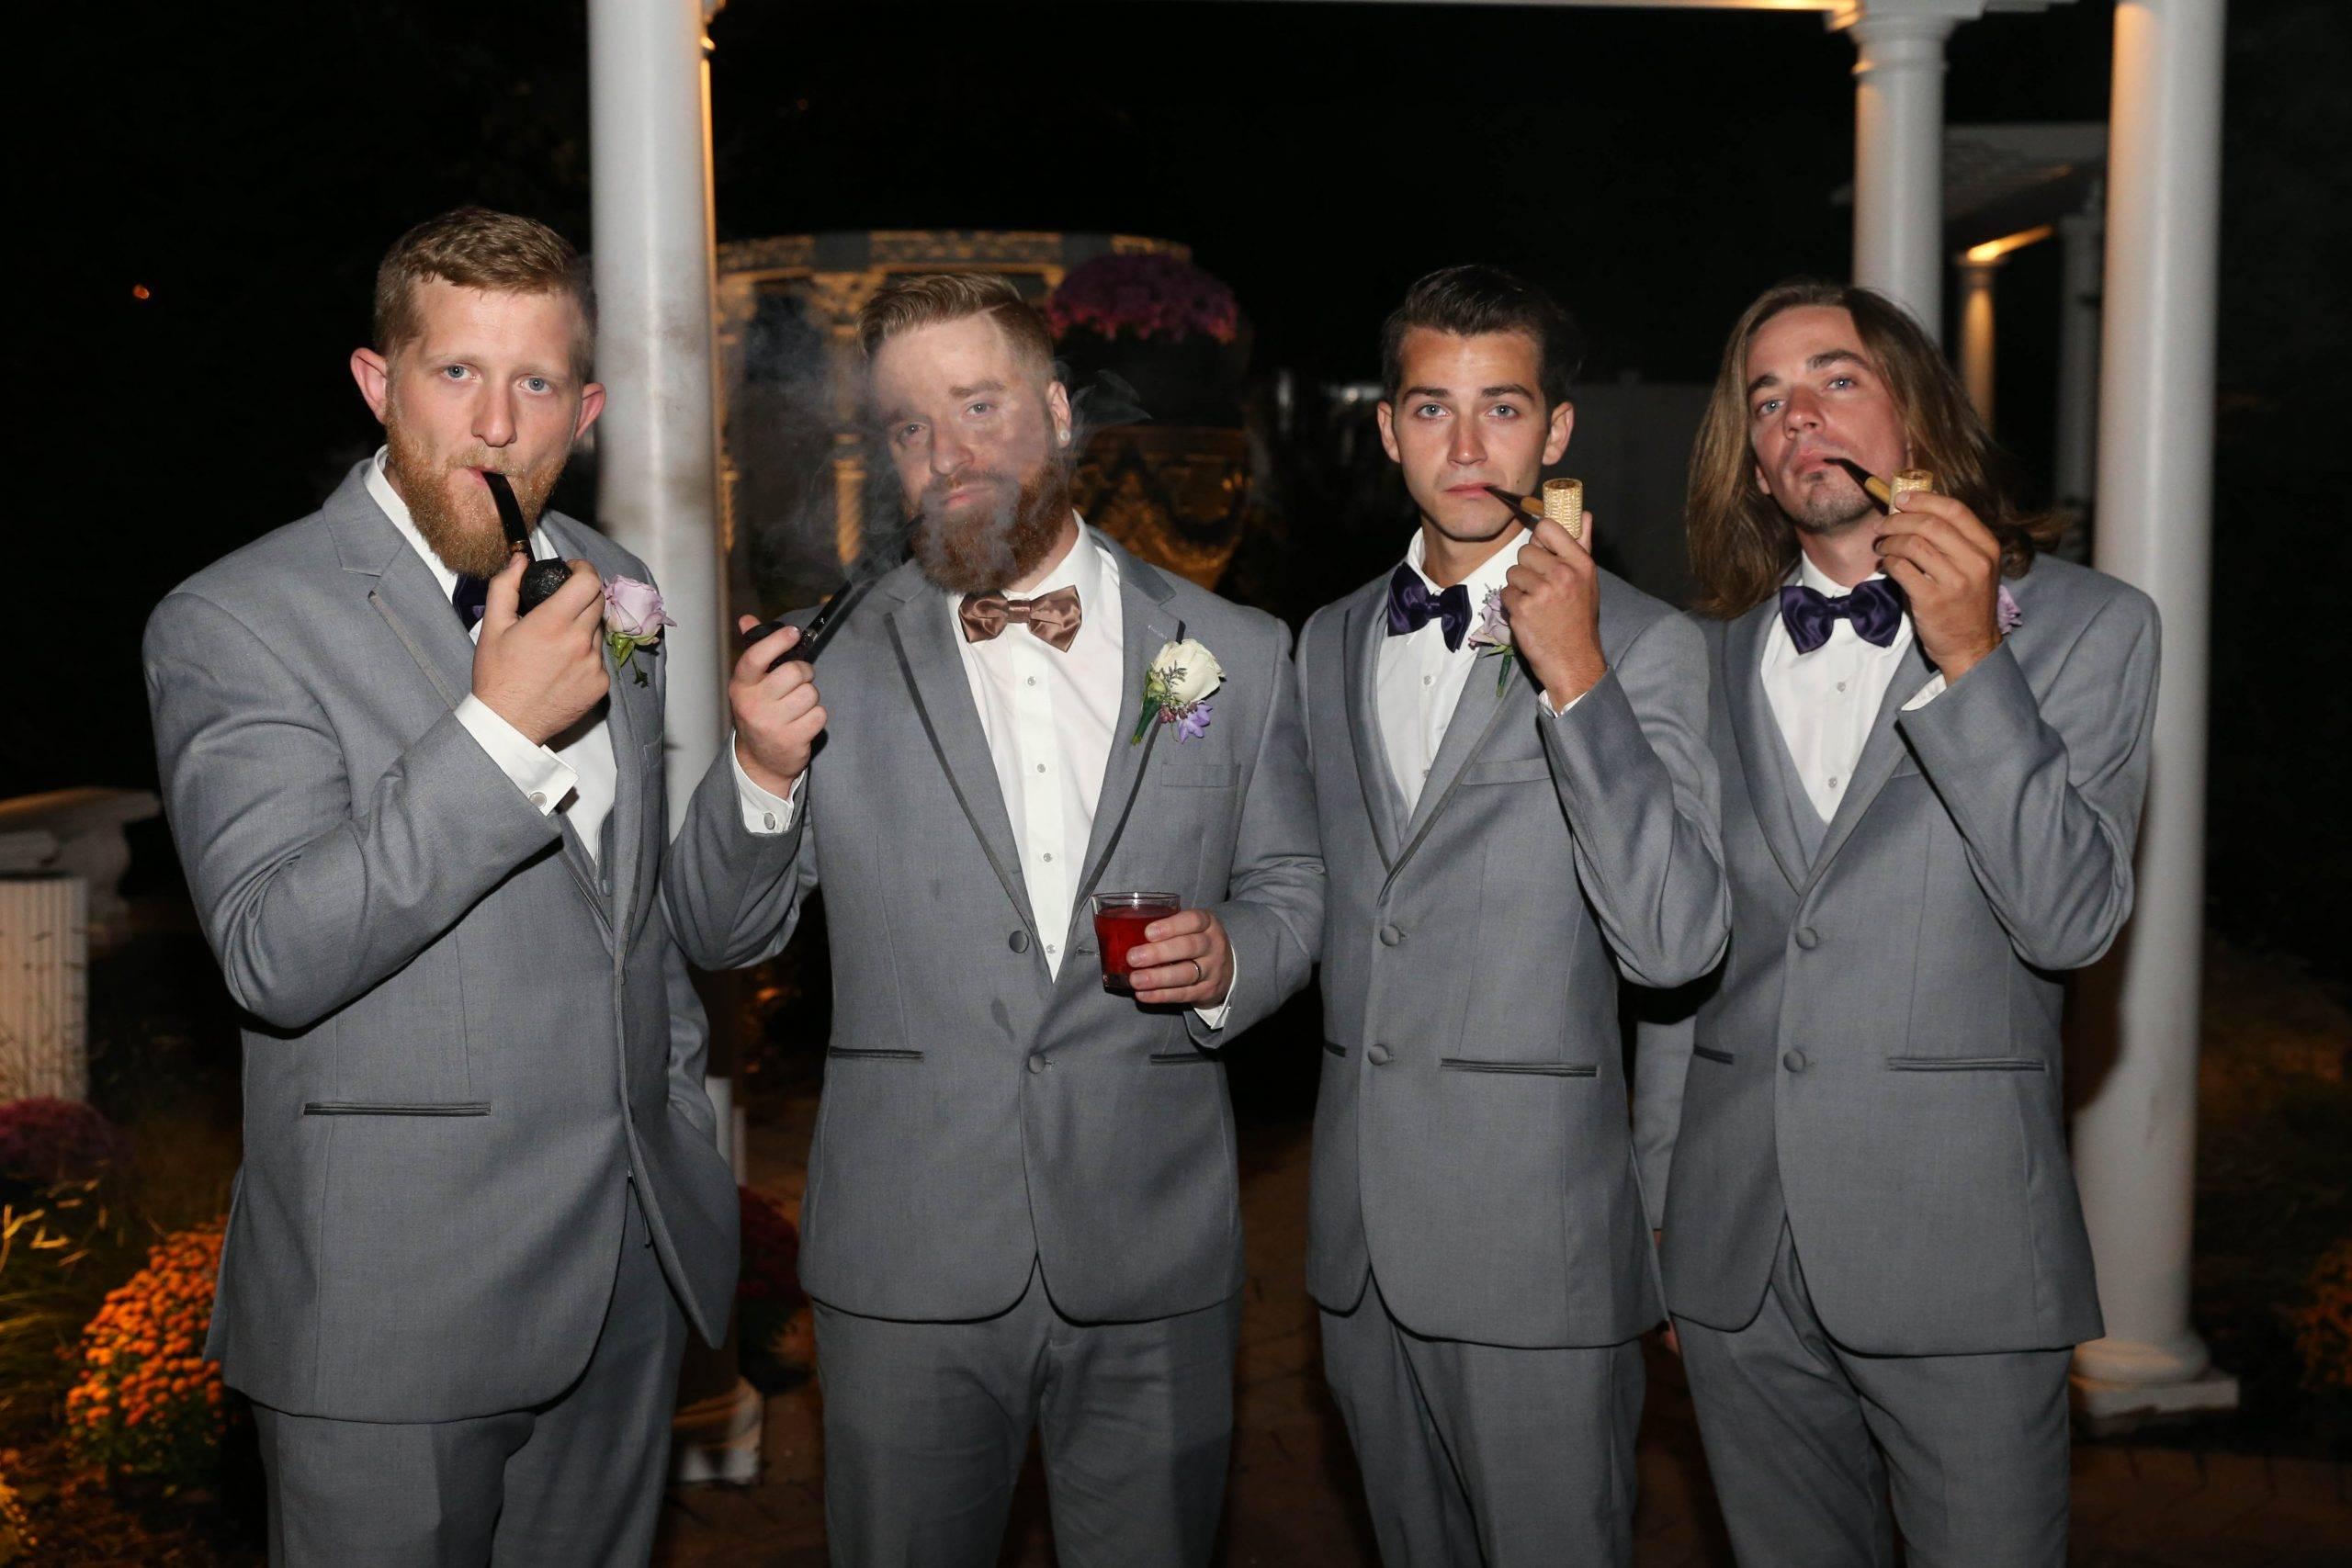 Primavera Regency groom and groomsmen smoking pipes